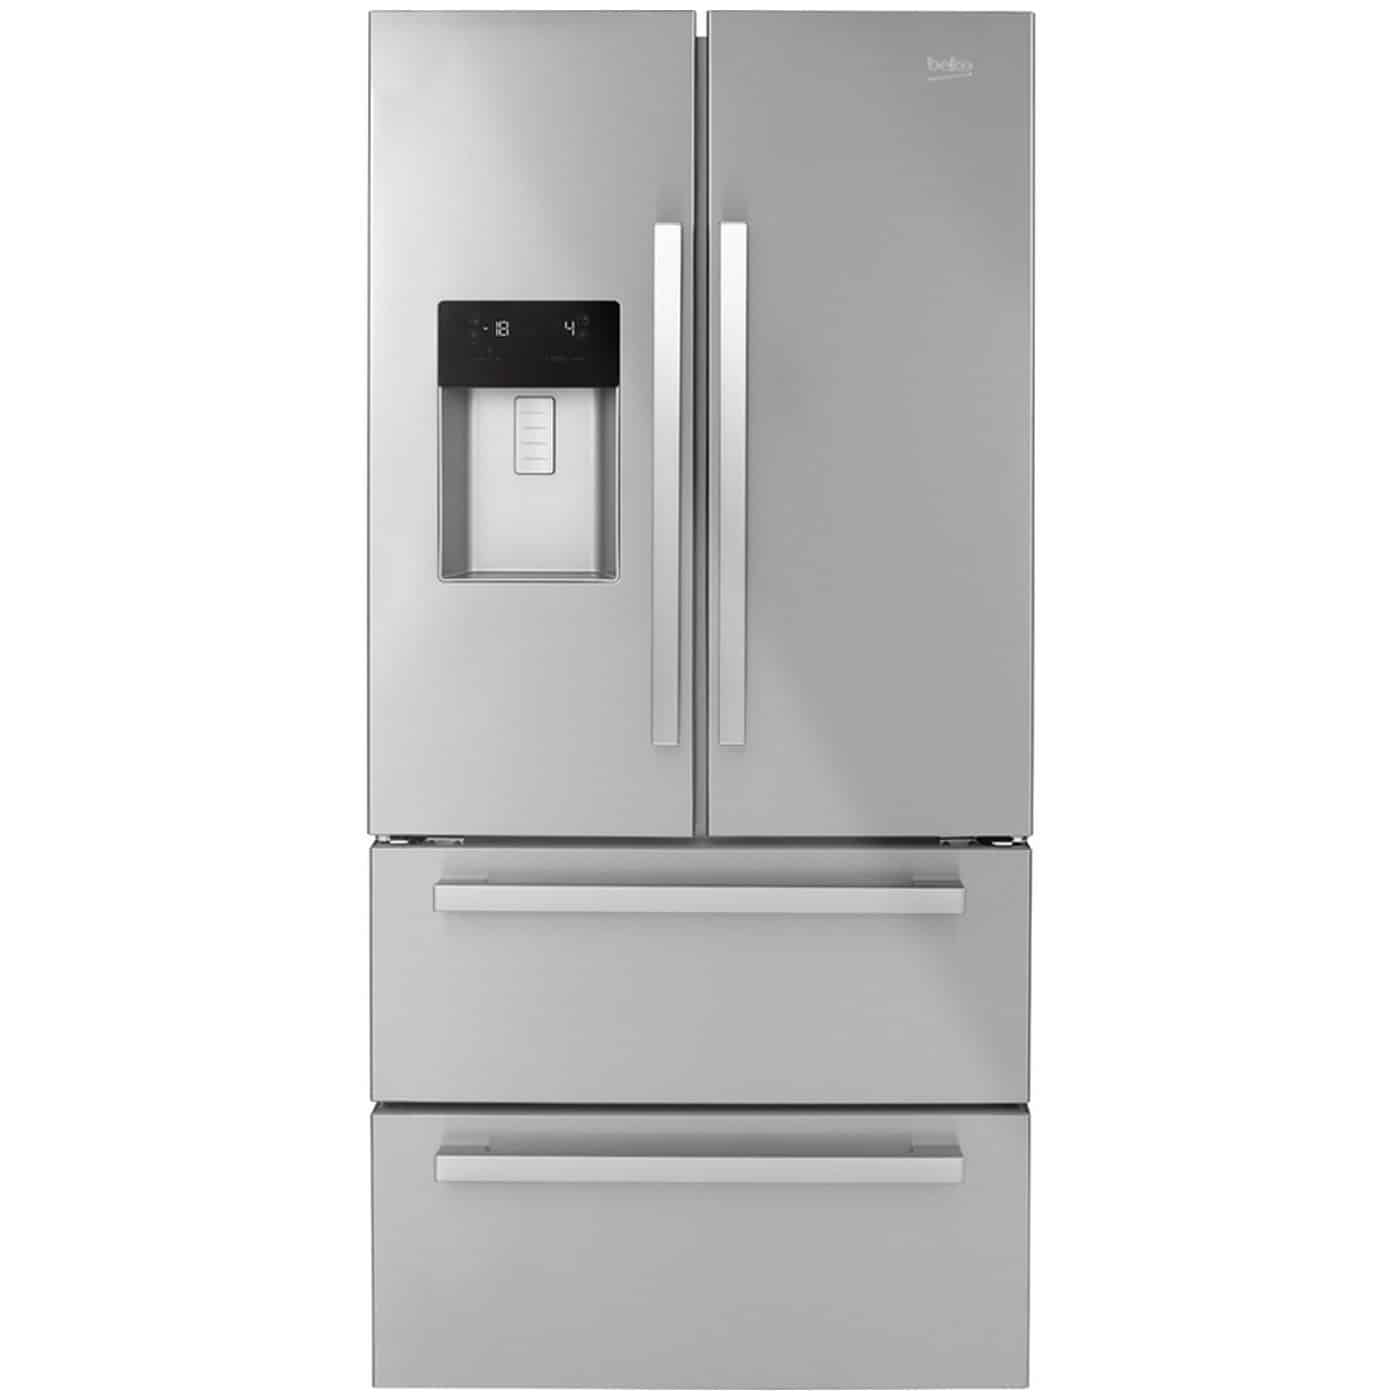 511 korting beko amerikaanse koelkast gne60530dx voor 788 bij mediamarkt. Black Bedroom Furniture Sets. Home Design Ideas